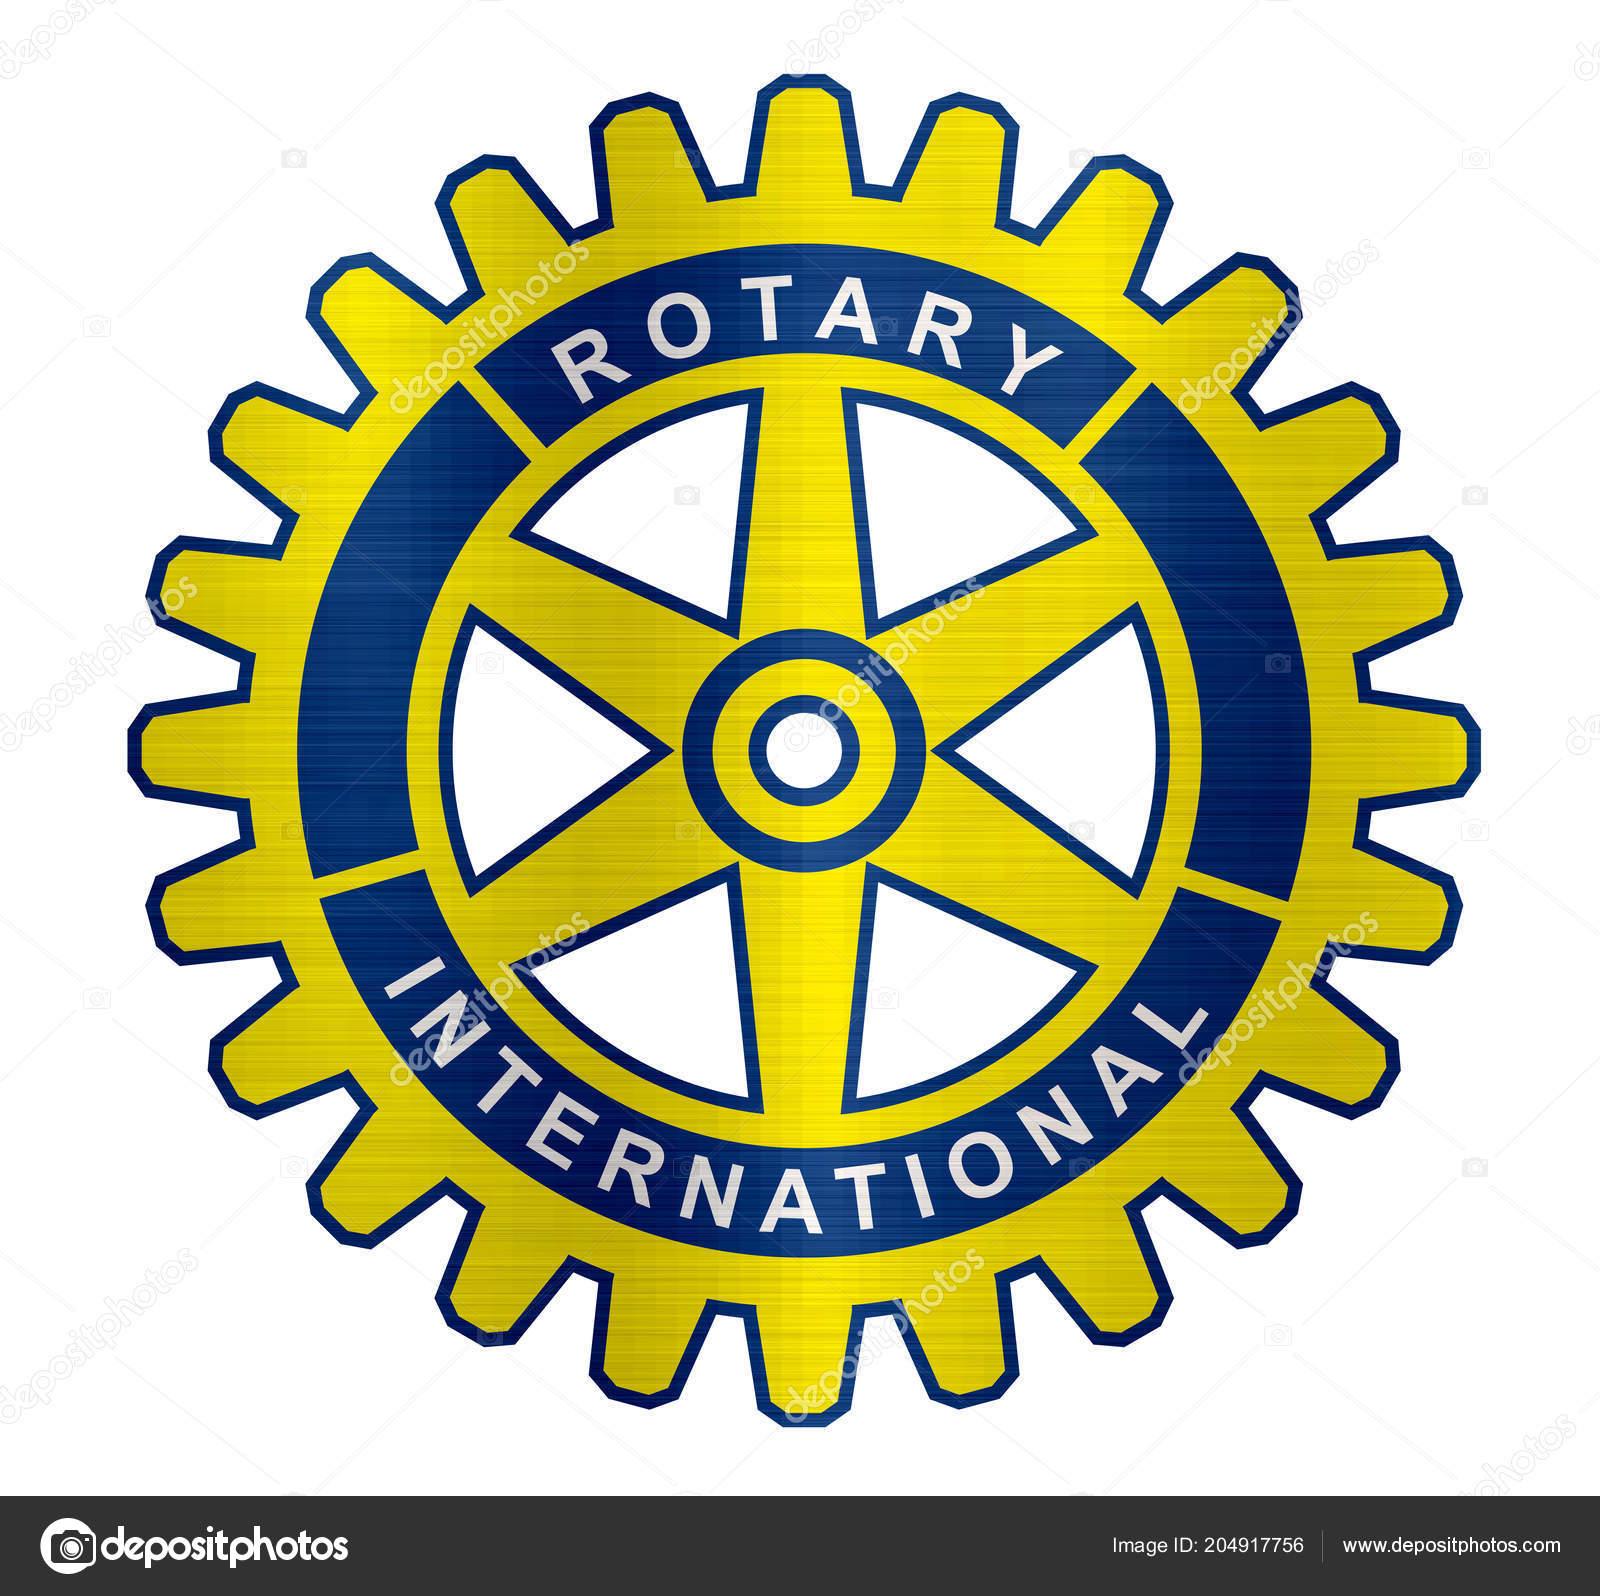 Rotary Club International Organization Logo Metallic Illustration